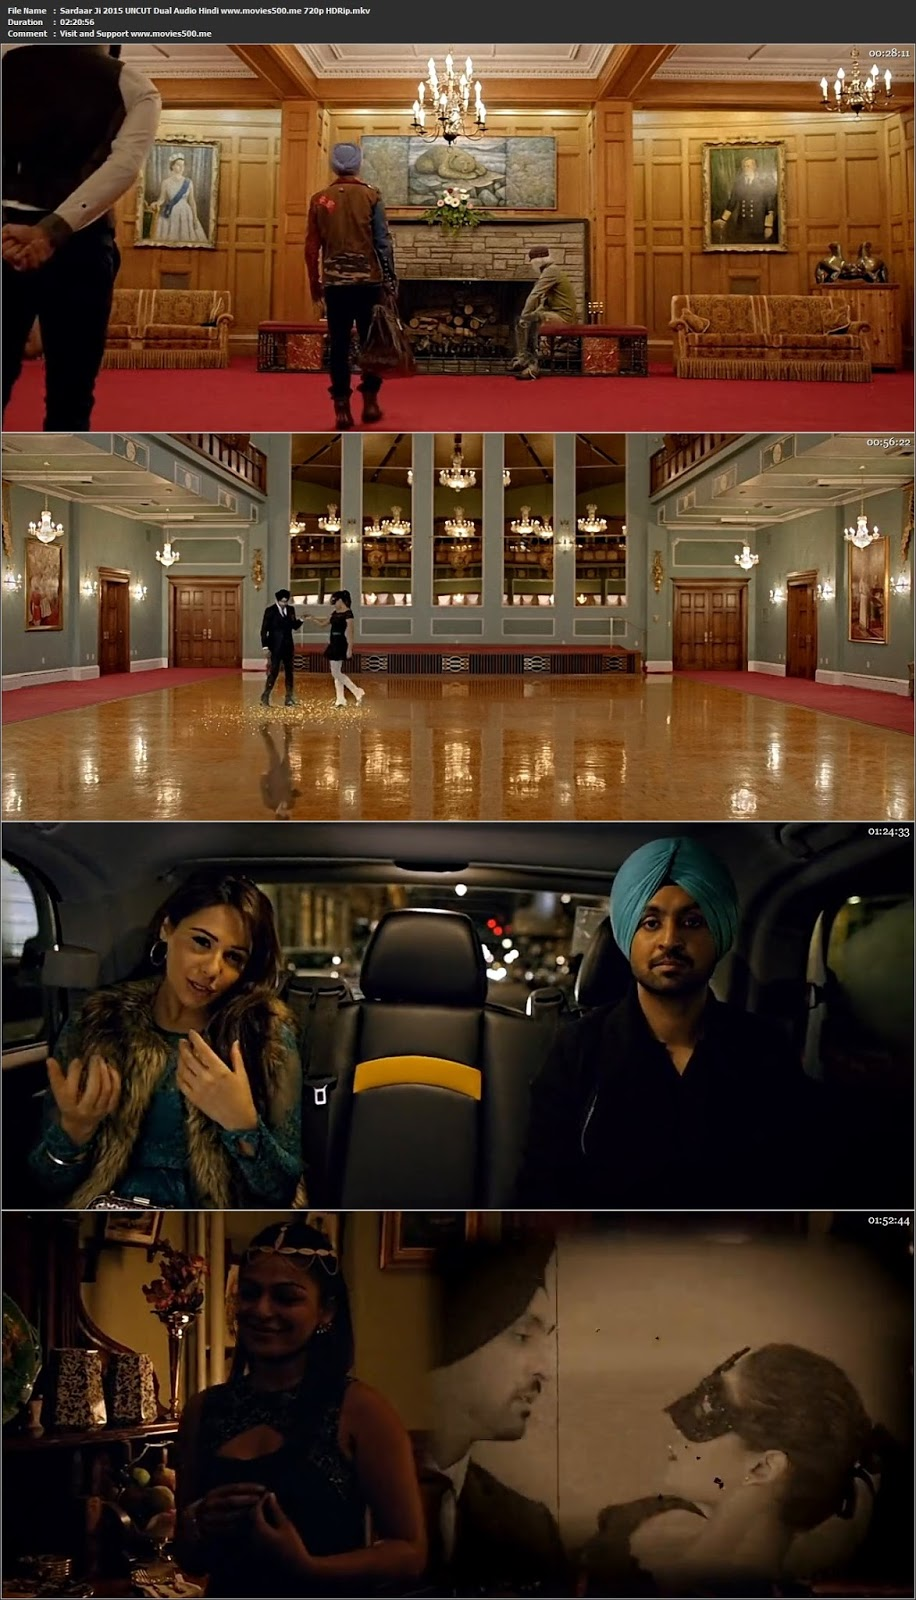 Sardaar Ji 2015 UNCUT Punjabi Movie HDRip 720p 1.4GB at mualfa.net